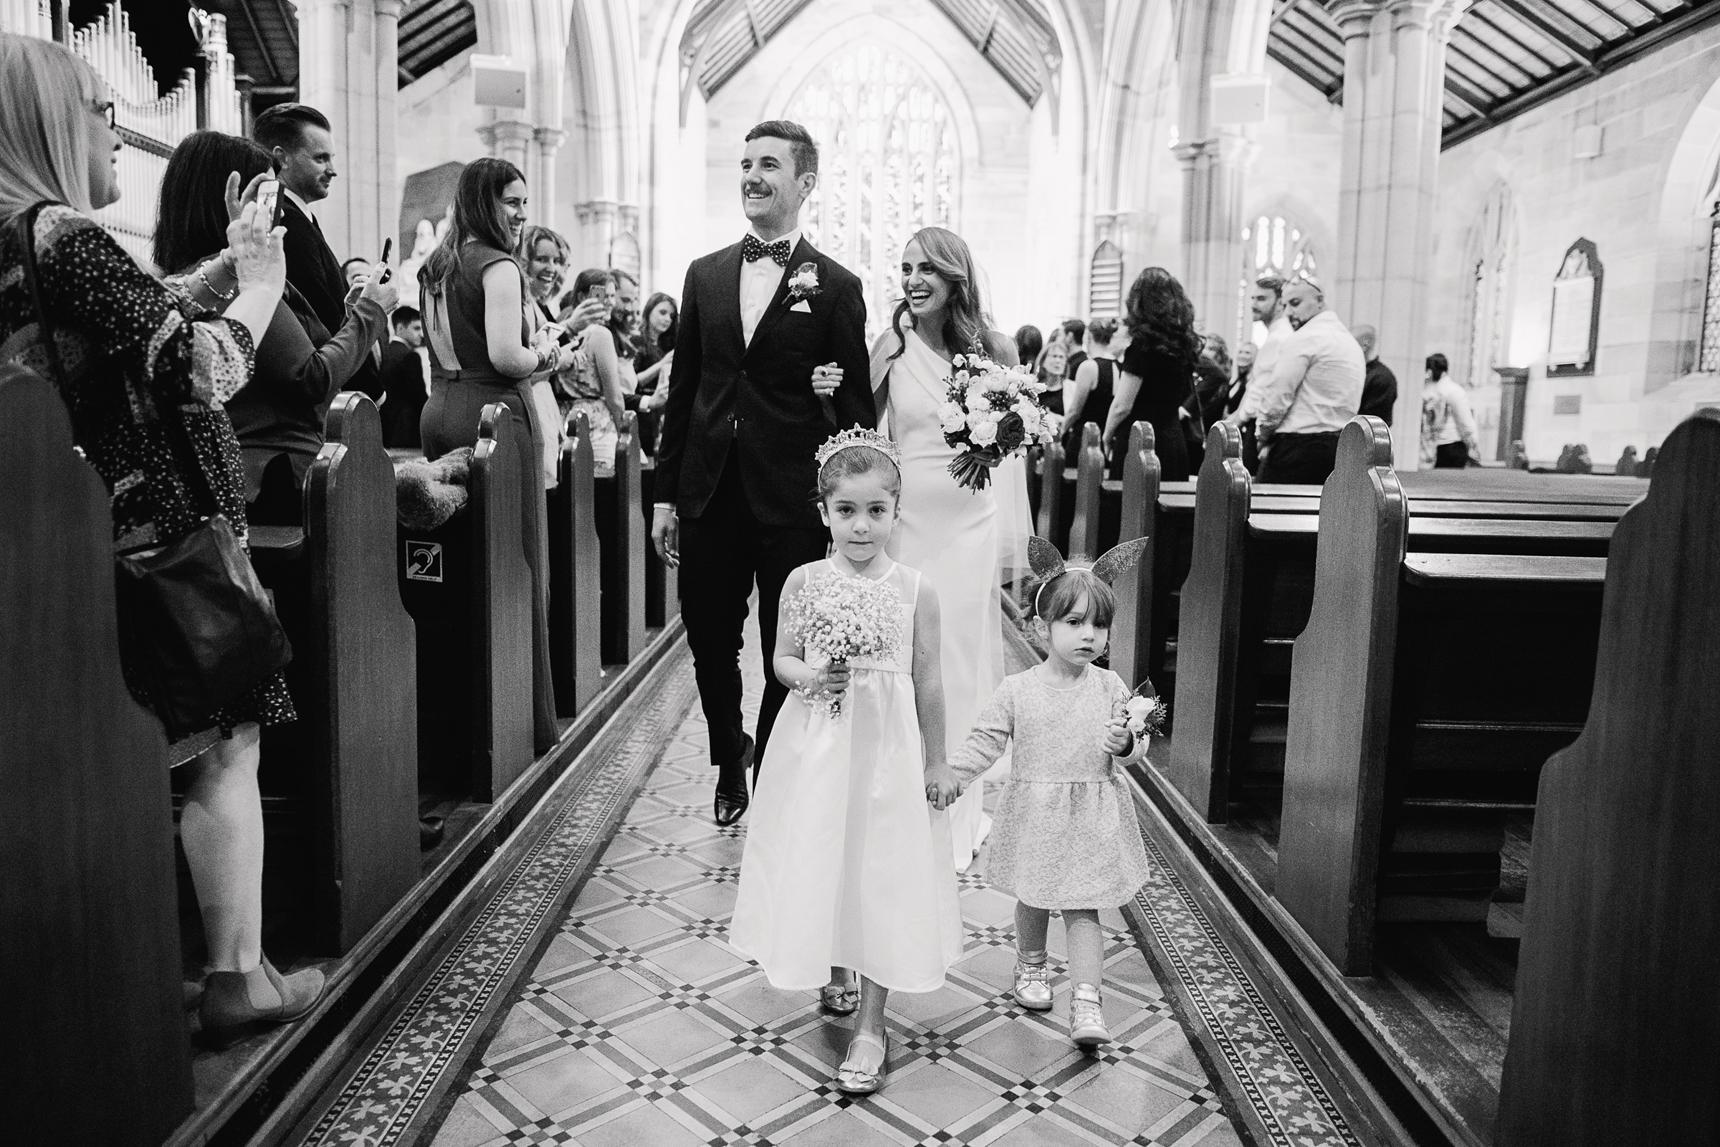 GregLana_ViewBySydney_WeddingPhotography041.jpg